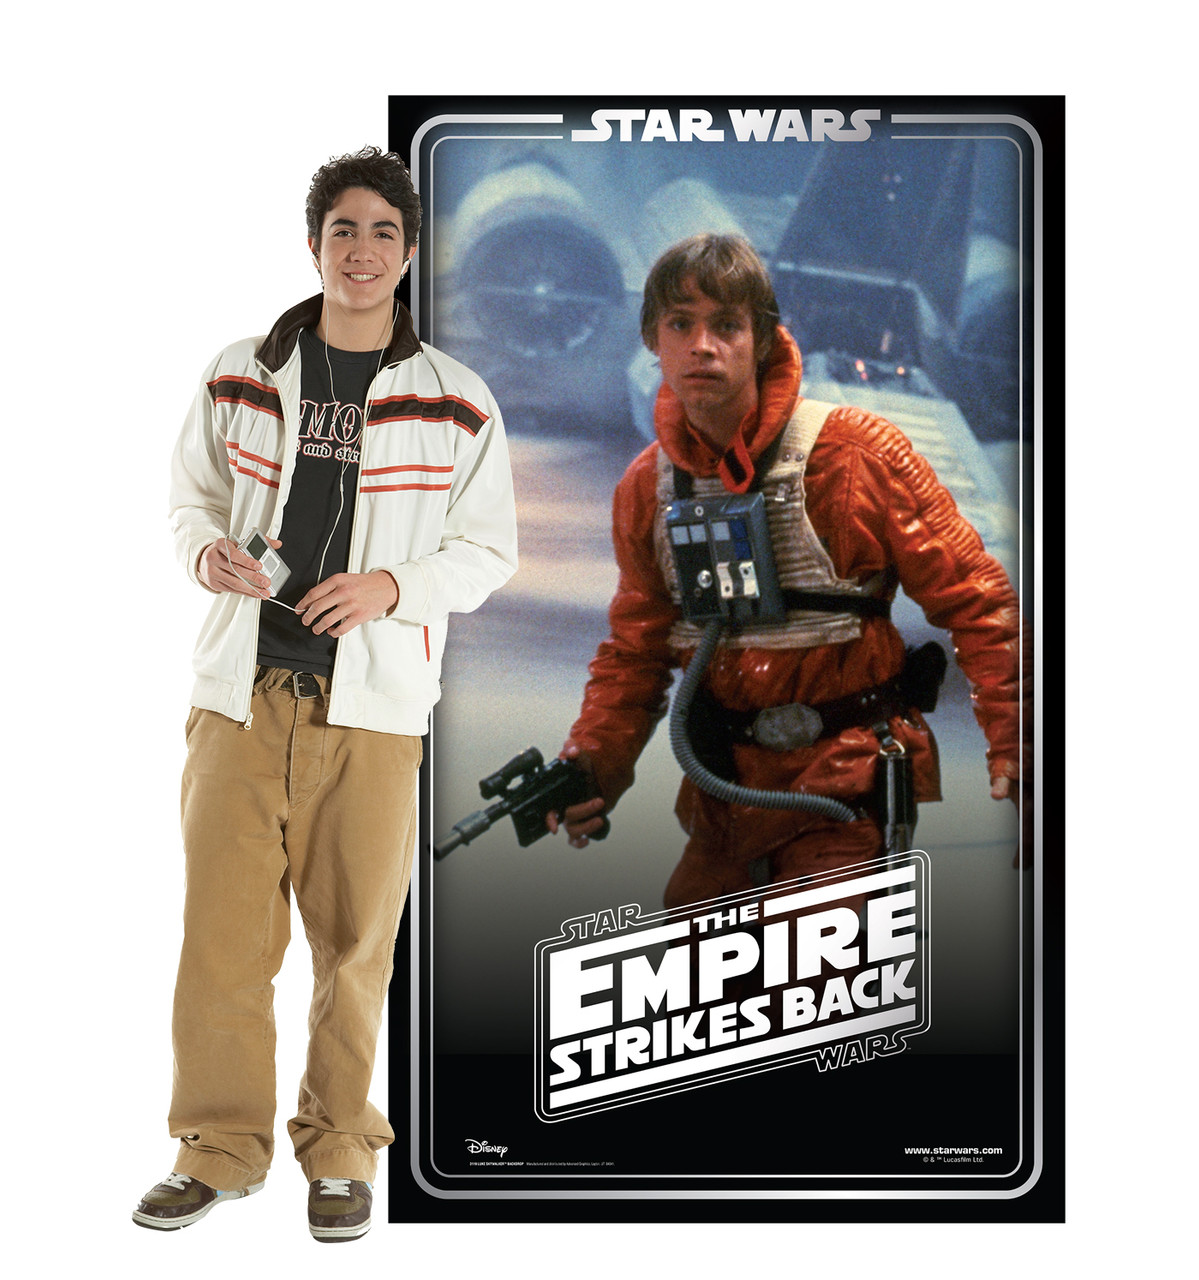 Life-size cardboard standee backdrop of Luke Skywalker. Celebrating 40 years, with model.